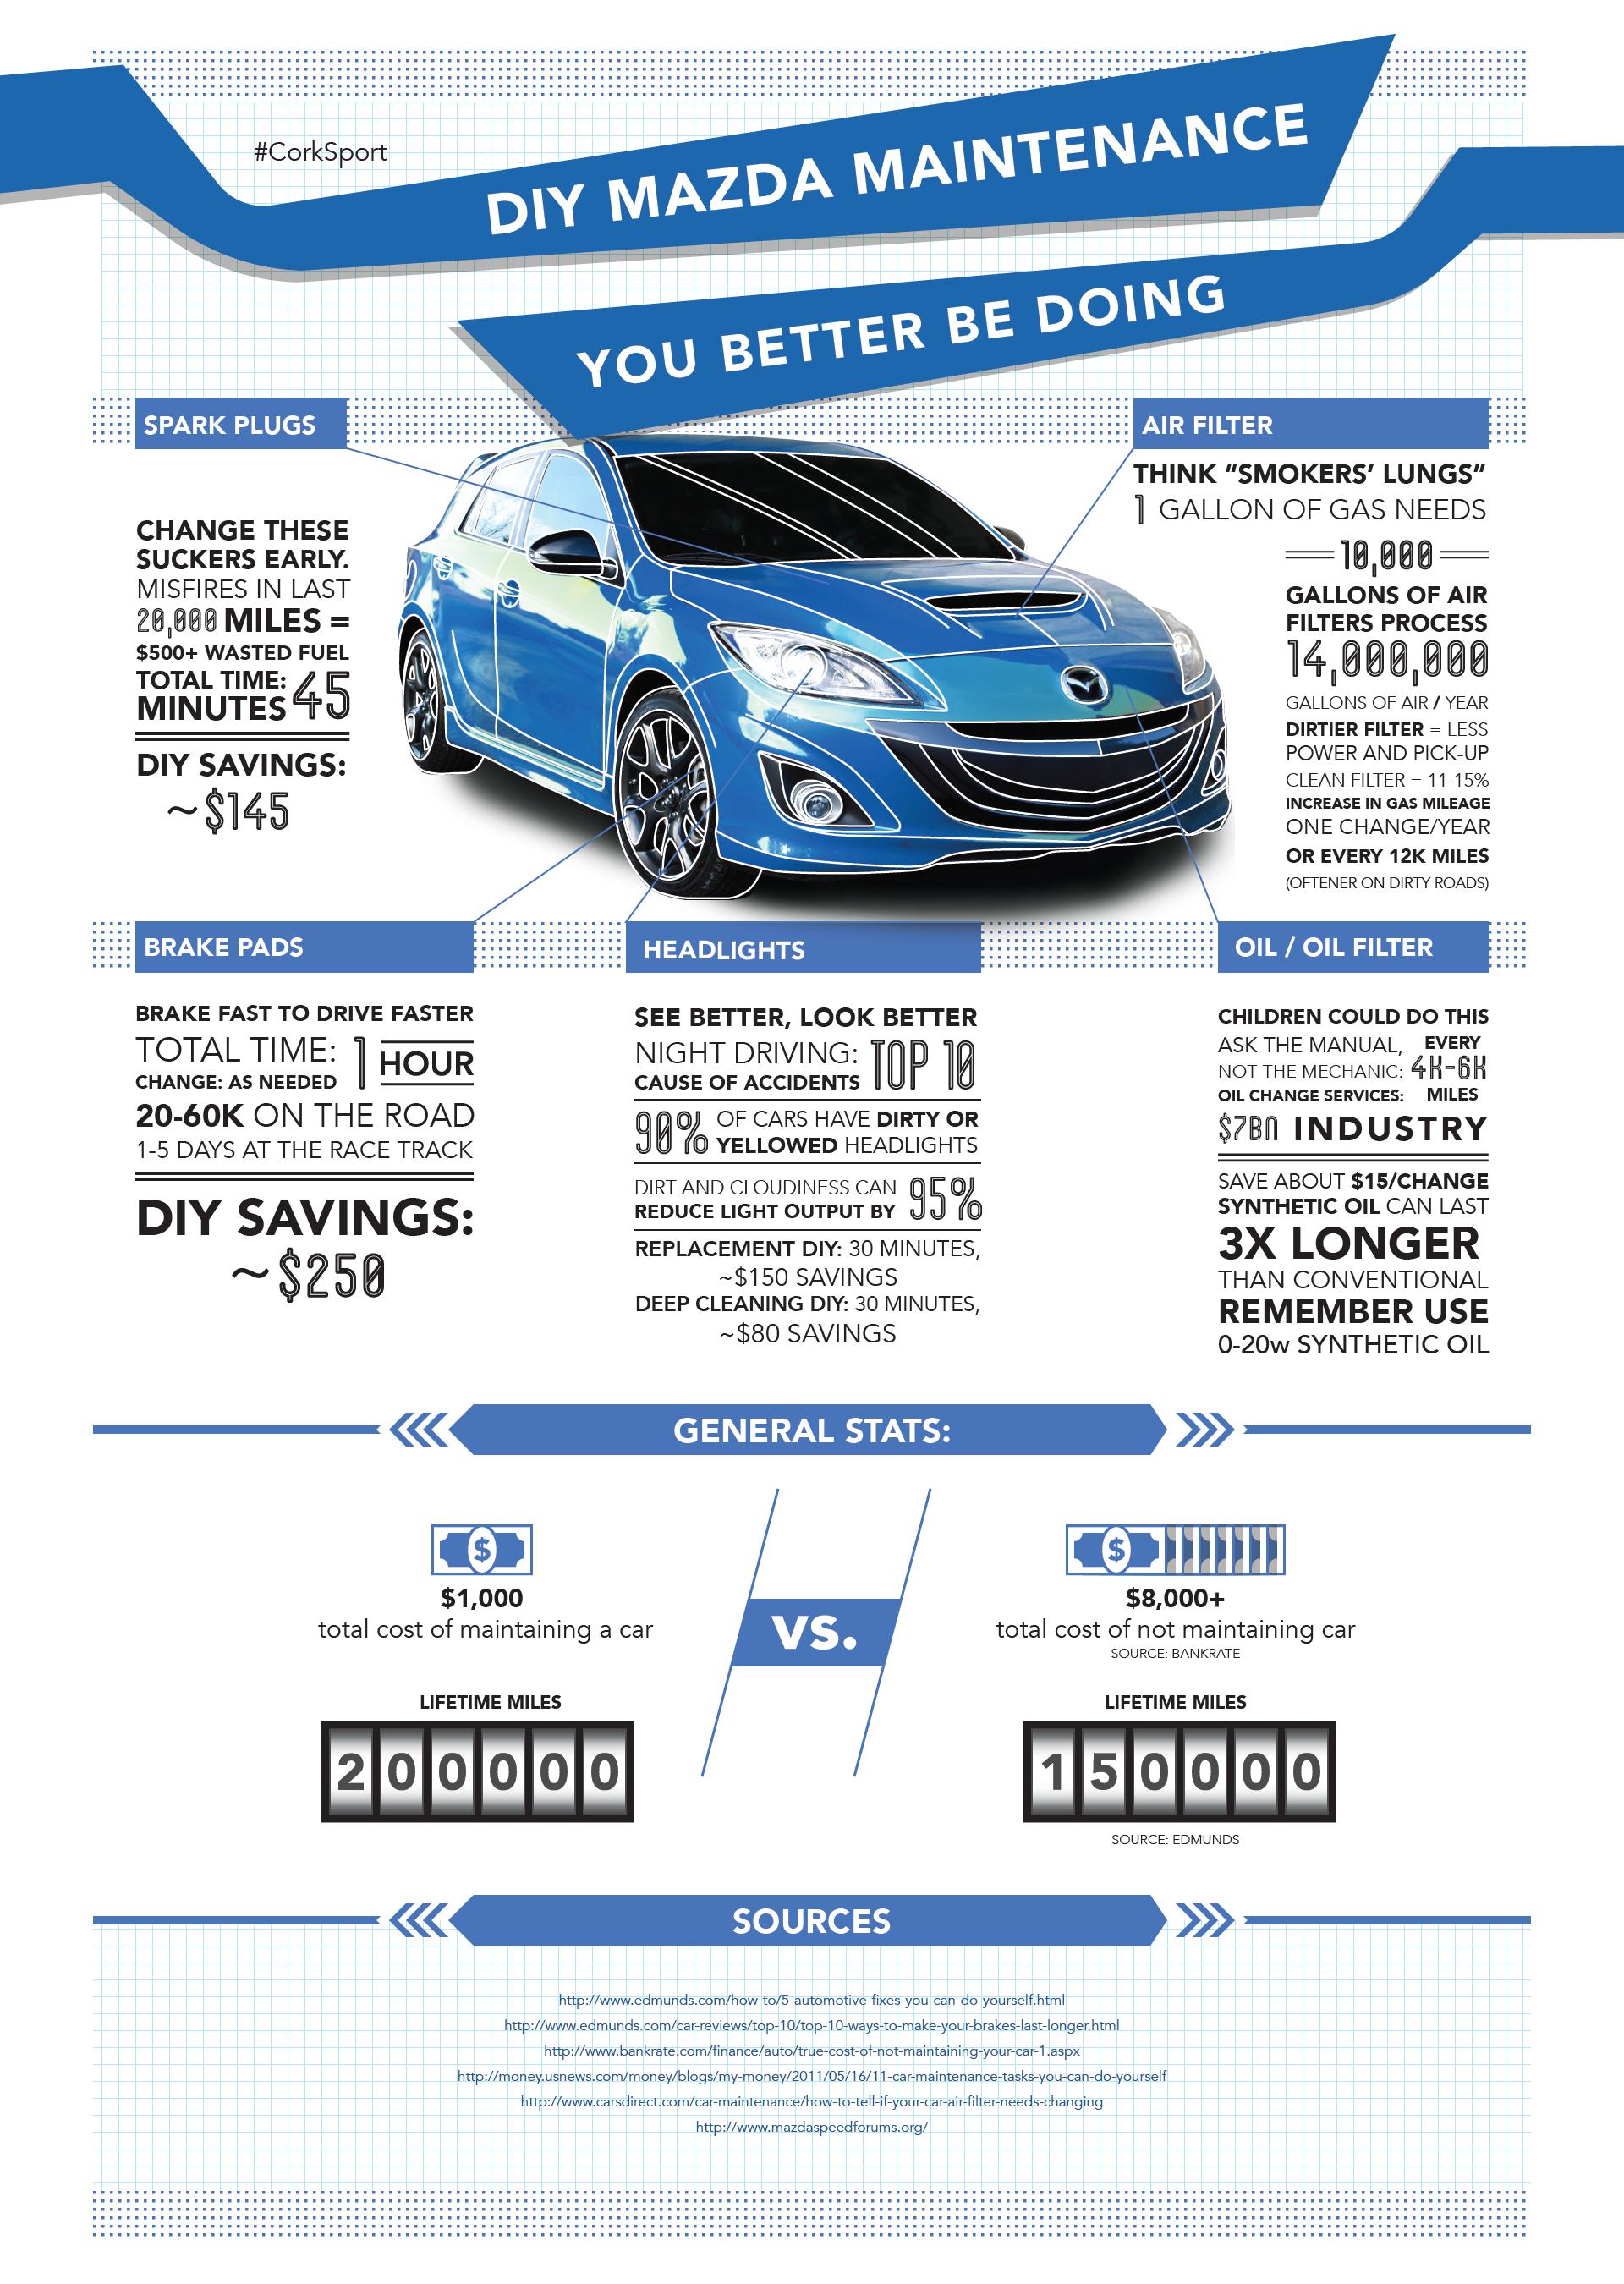 CorkSport Mazda Maintenance Infographic.png